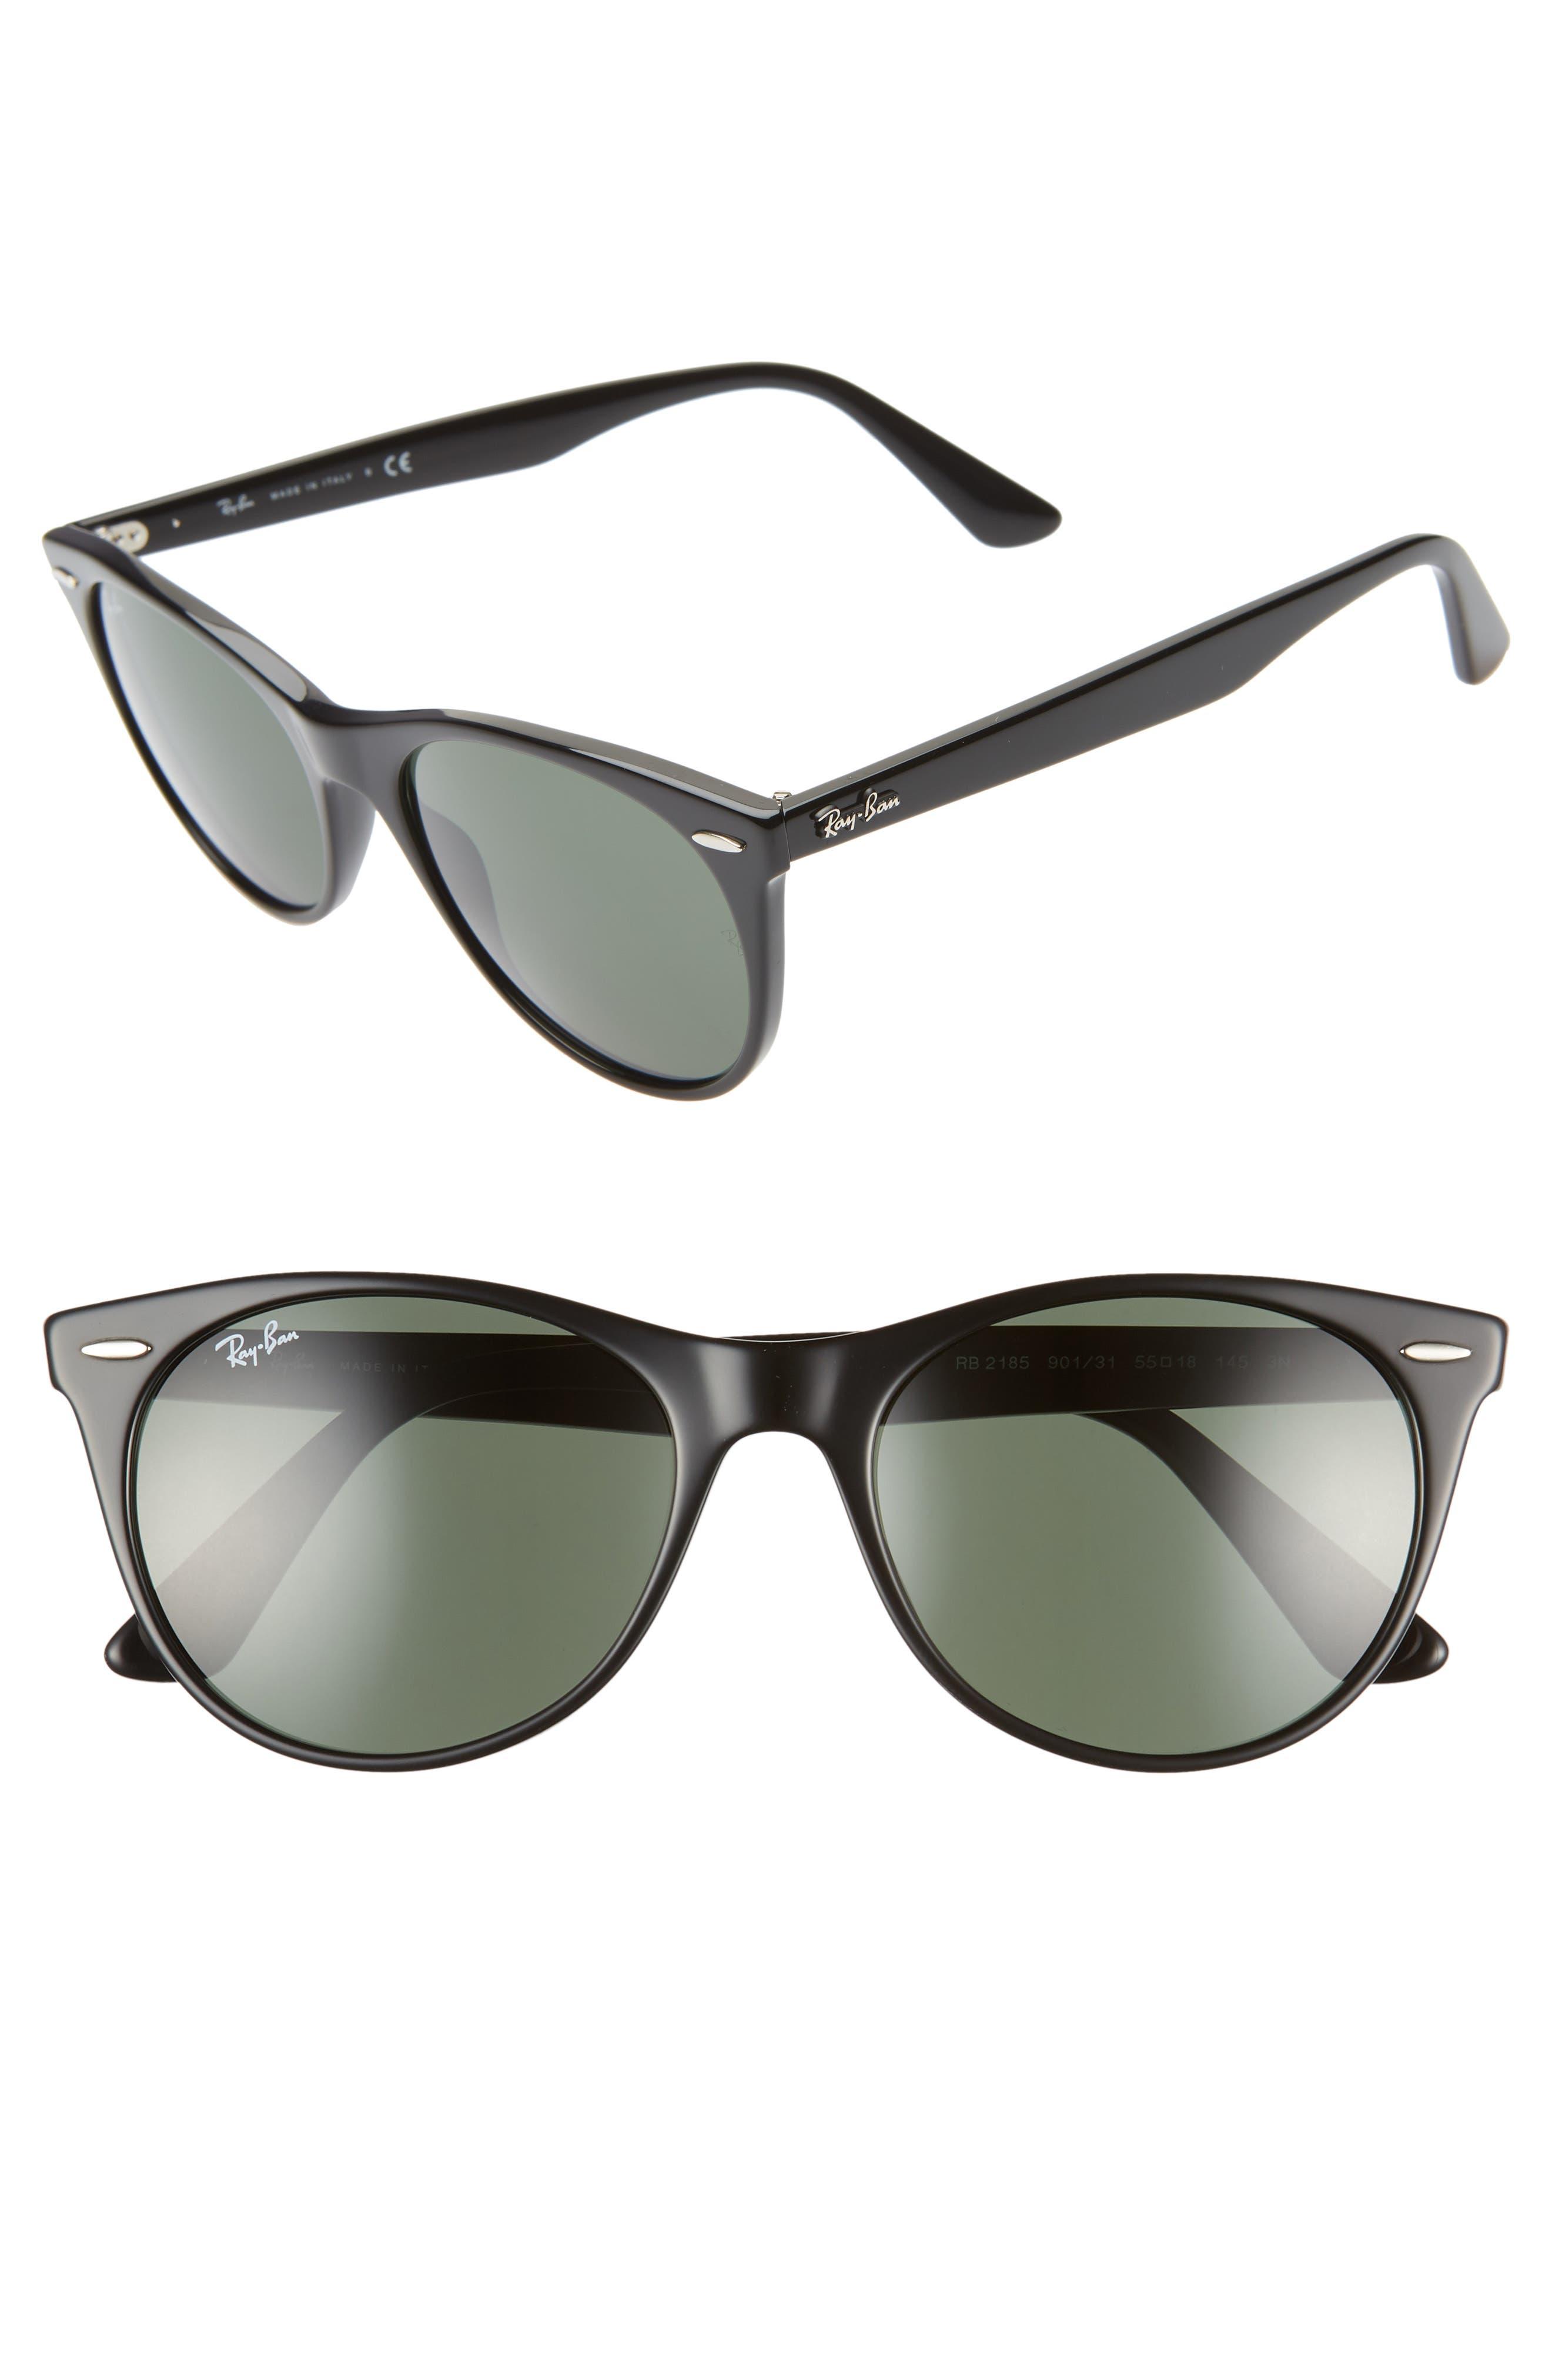 Ray-Ban 55Mm Round Wayfarer Sunglasses - Black Solid